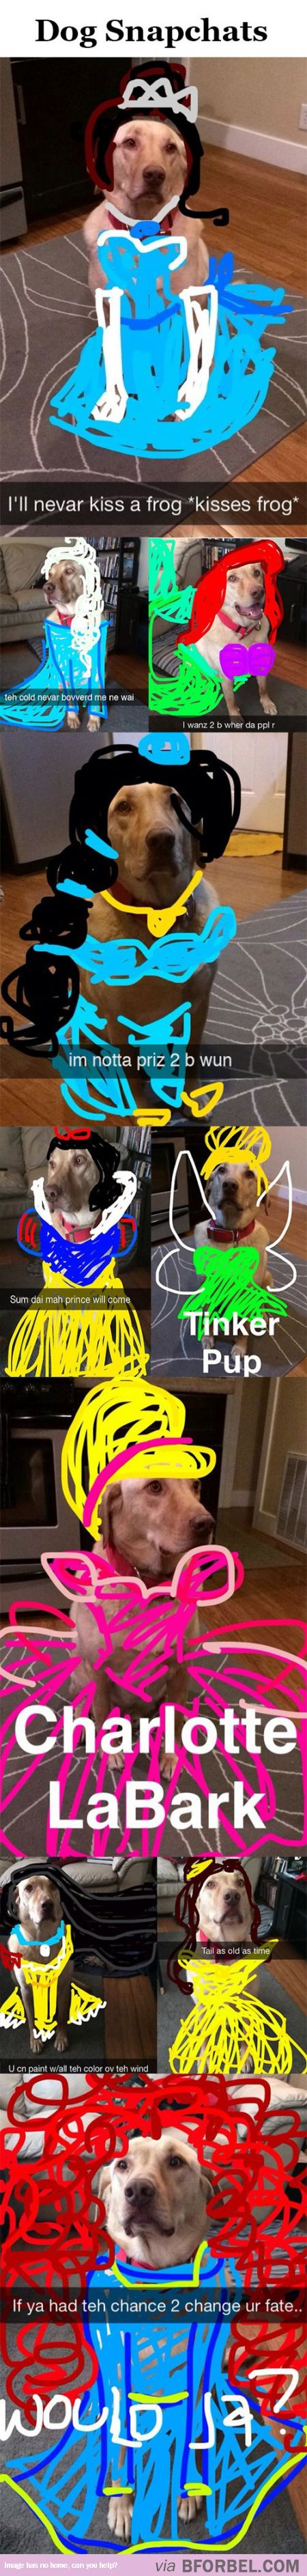 10 Snapchats That Turned This Dog Into A Disney Princess… i really like this <<<<< OMG HAHAHAHAHAHAHAHAHAHAHAHAHAHAHAHAHaHAHAHAHAHAHAHAHAHaHAHA